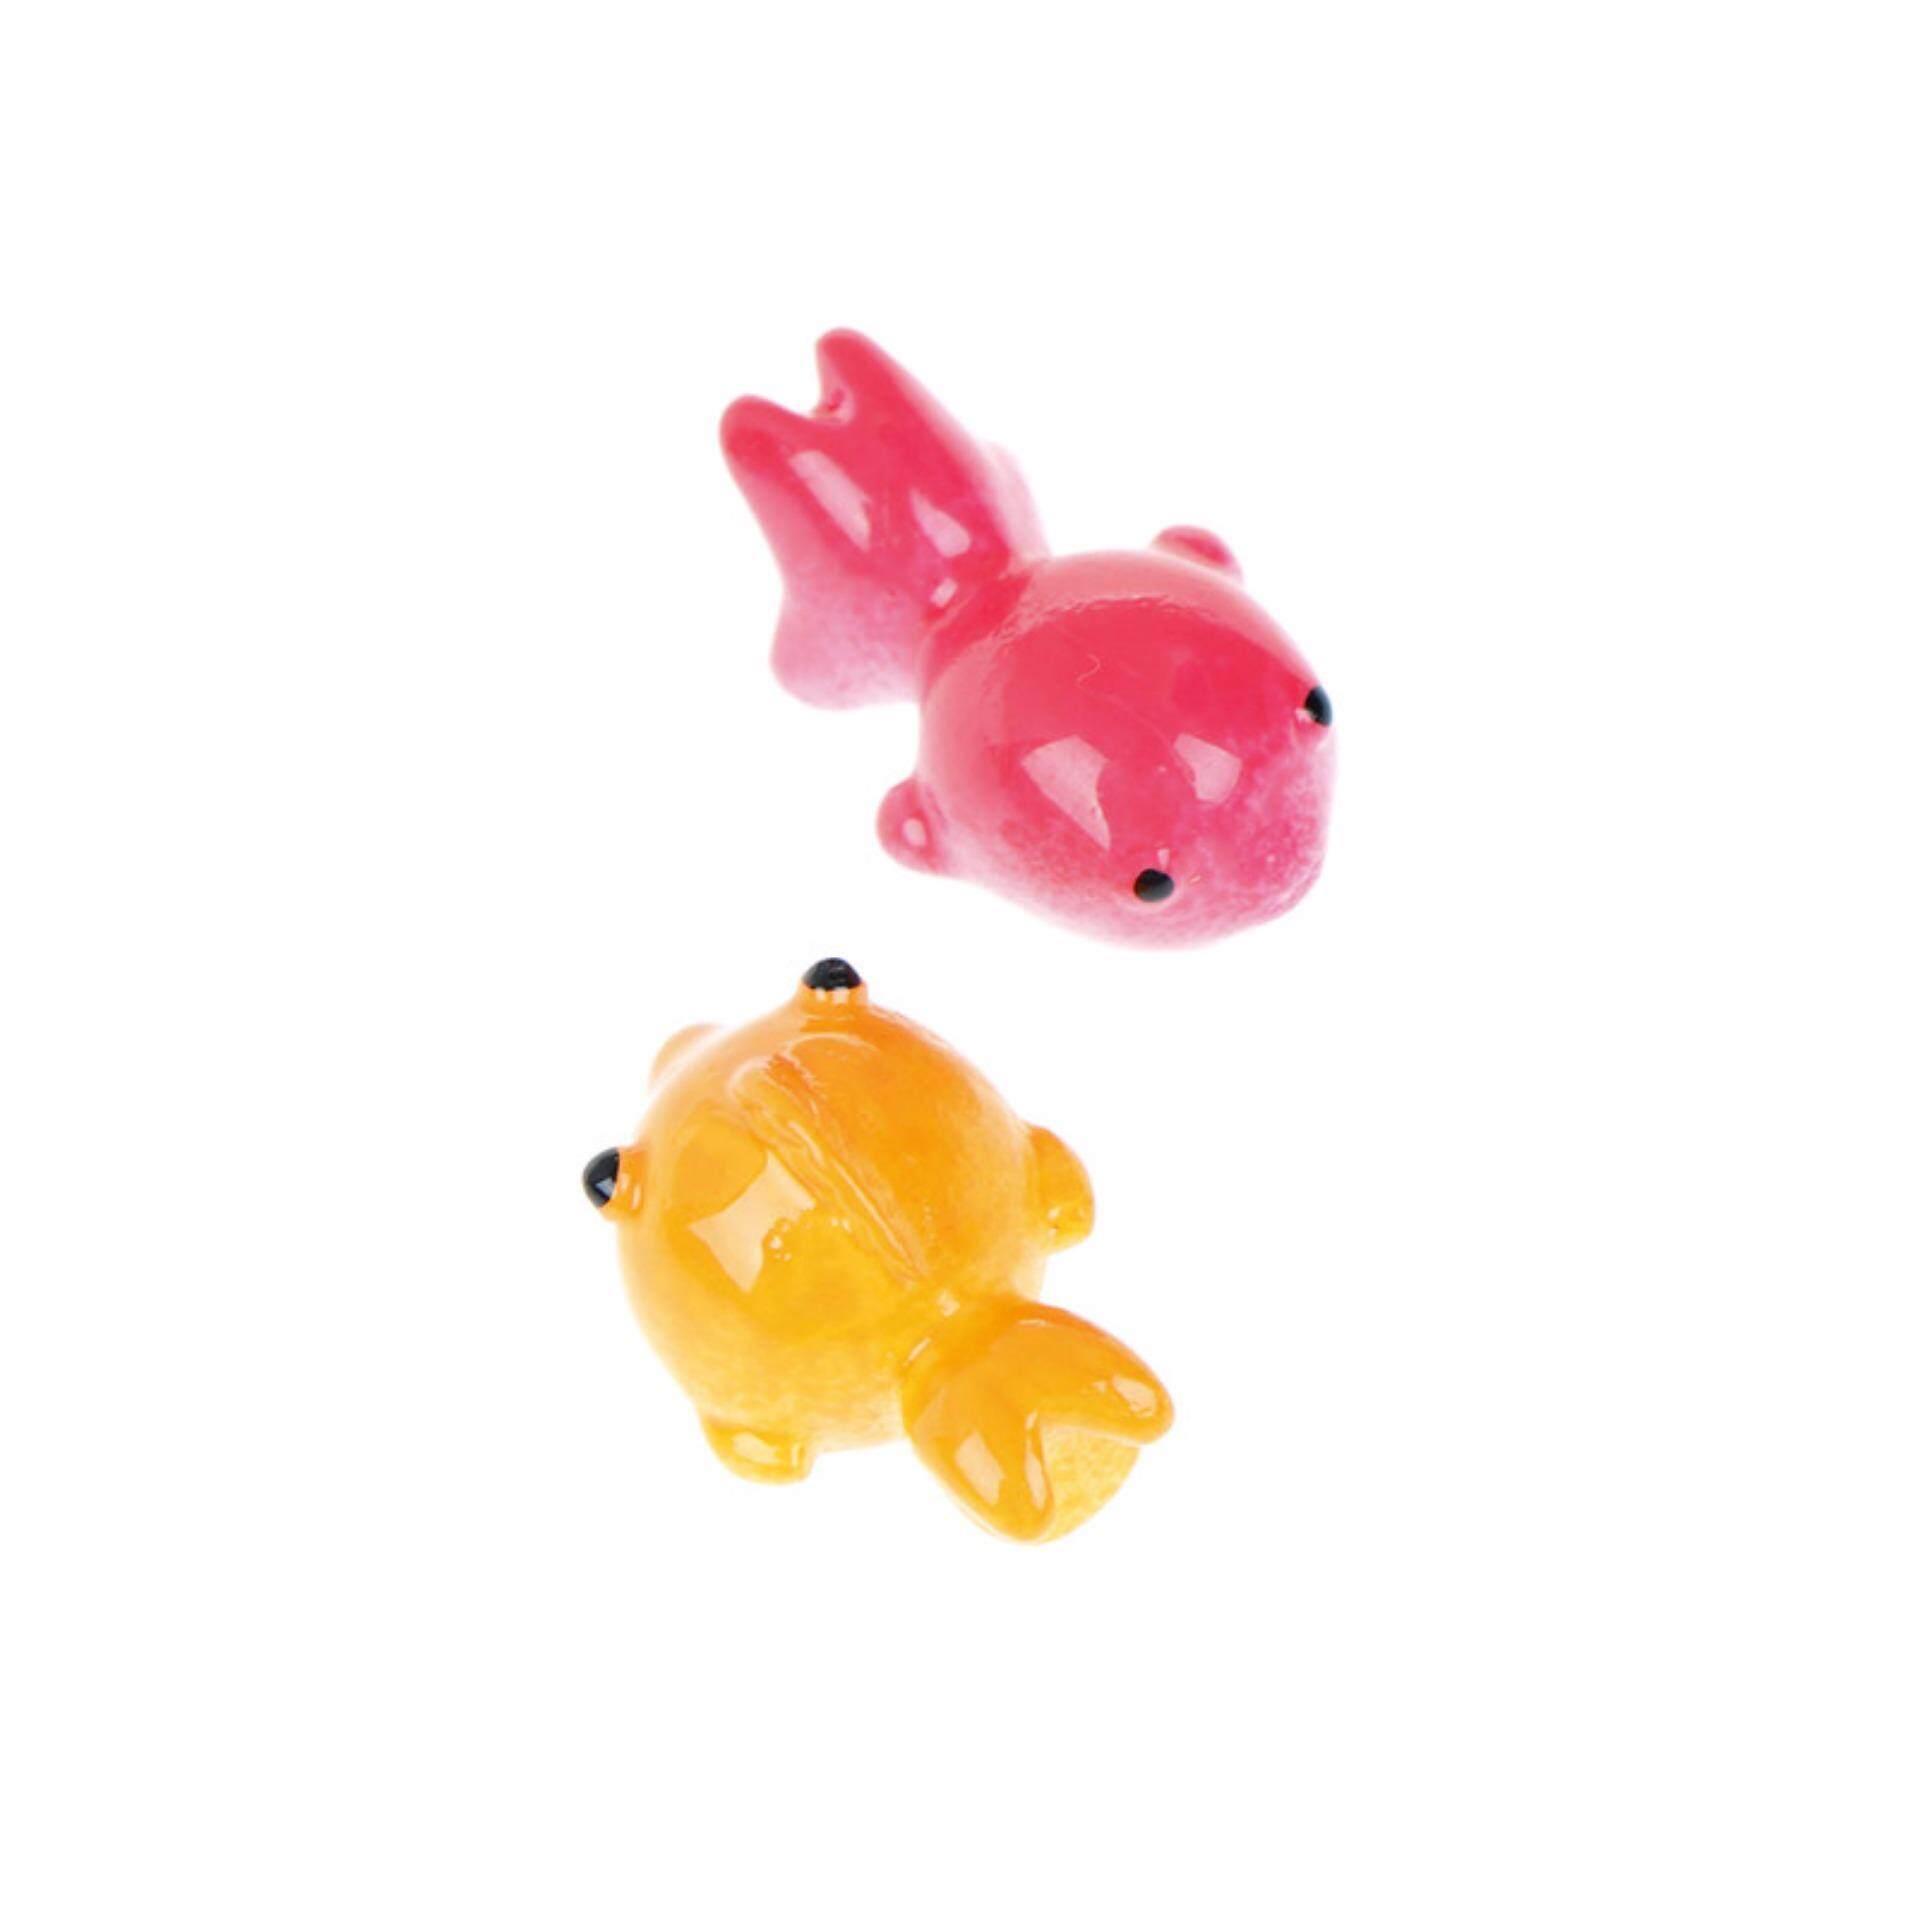 Goldfish Resin Miniature Figurine Garden Dollhouse Decor Micro Landscape 2pcs